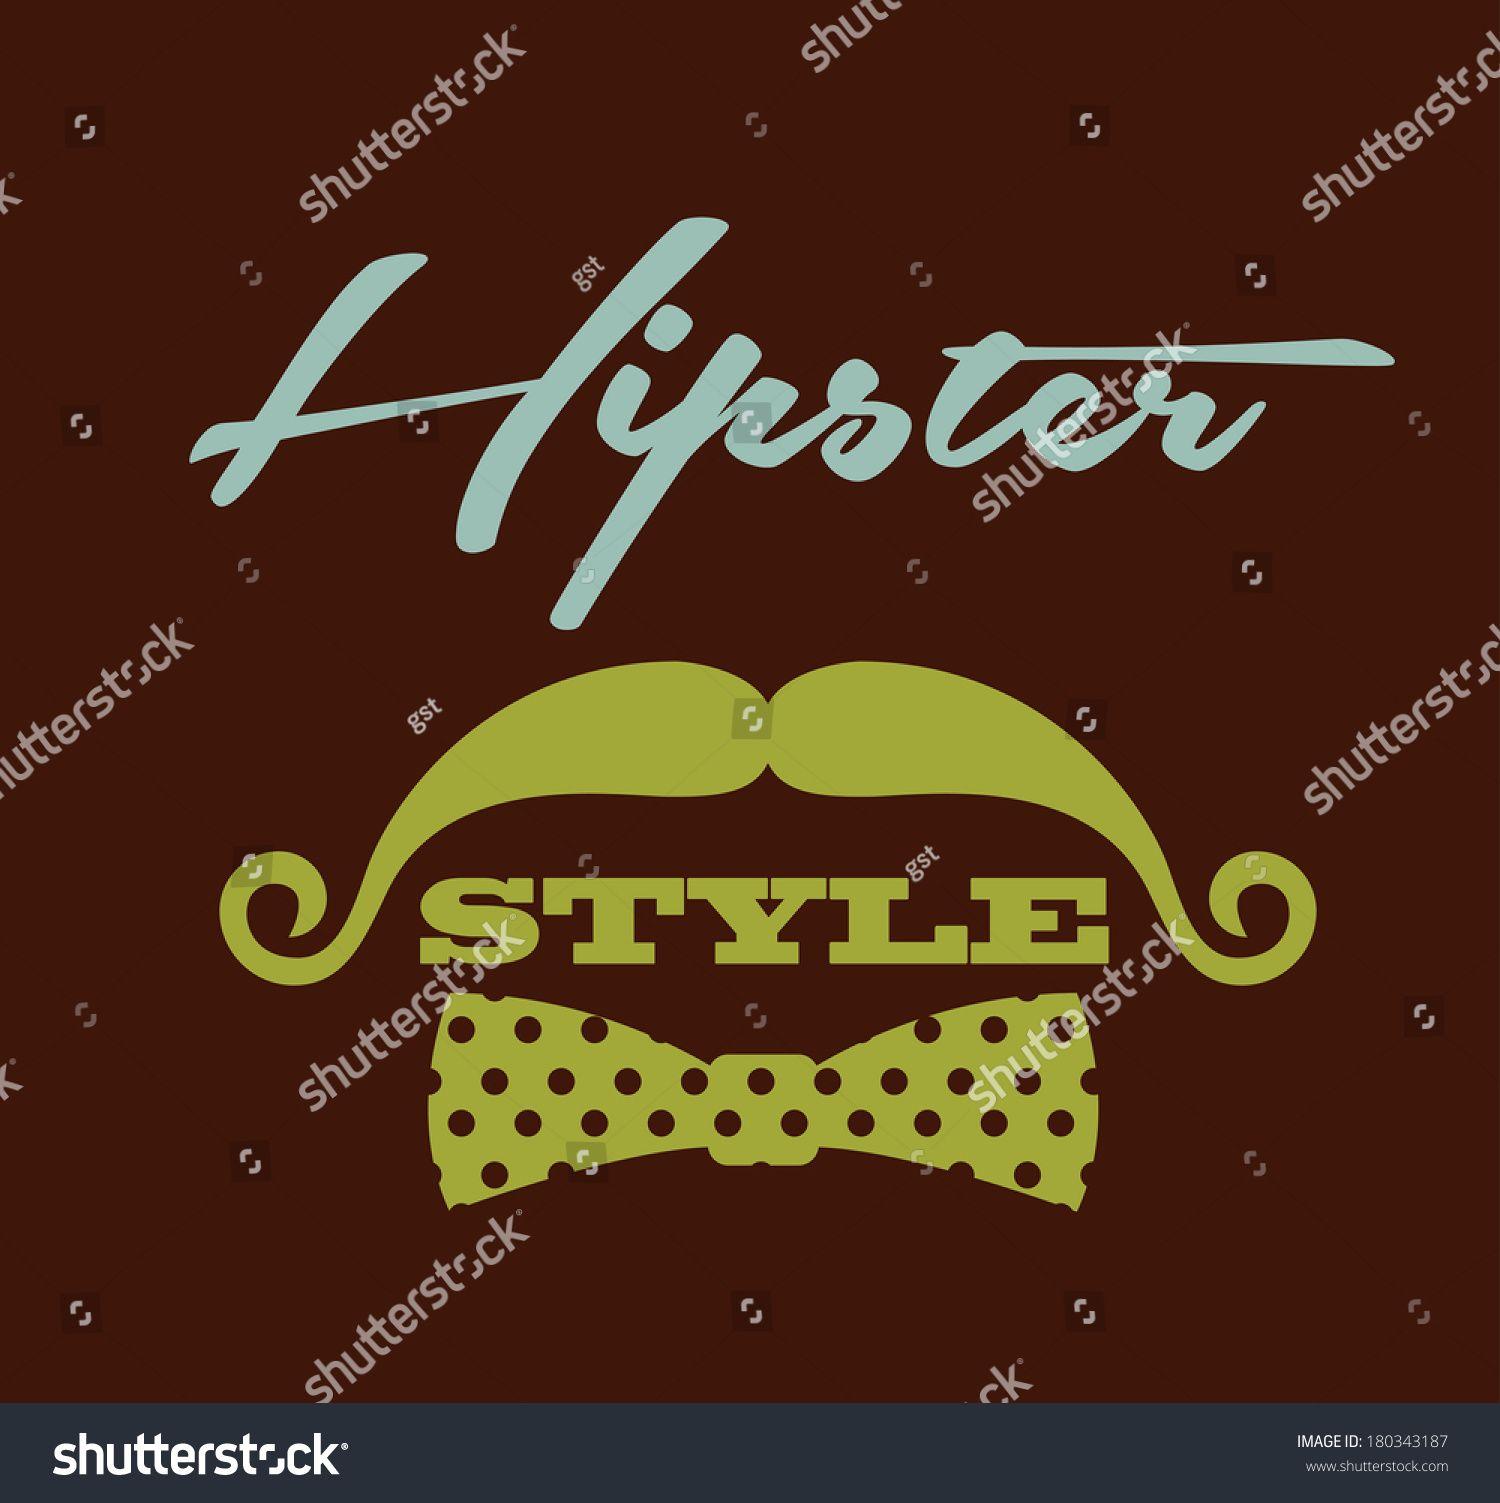 Retro Style Design Over Vintage Background Vector Illustration Ad Ad Design Style Retro Vintage In 2020 Wedding Website Template Background Vintage Retro